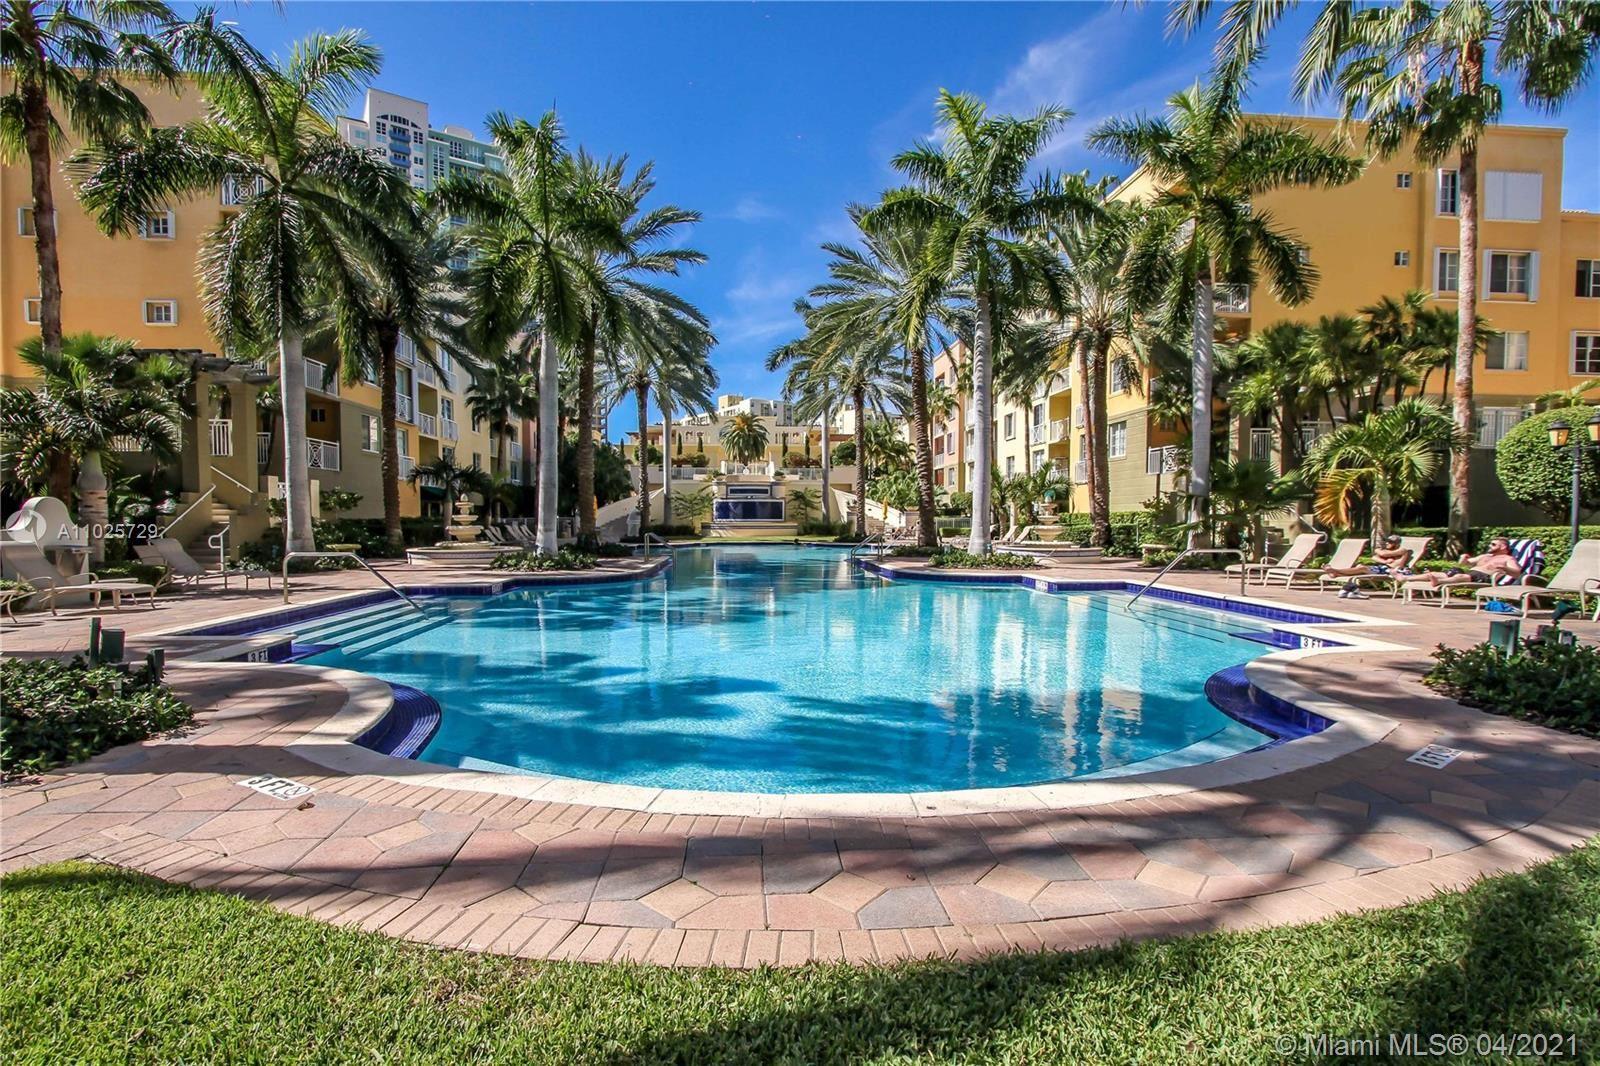 140 Meridian Ave #314, Miami Beach, FL 33139 - #: A11025729